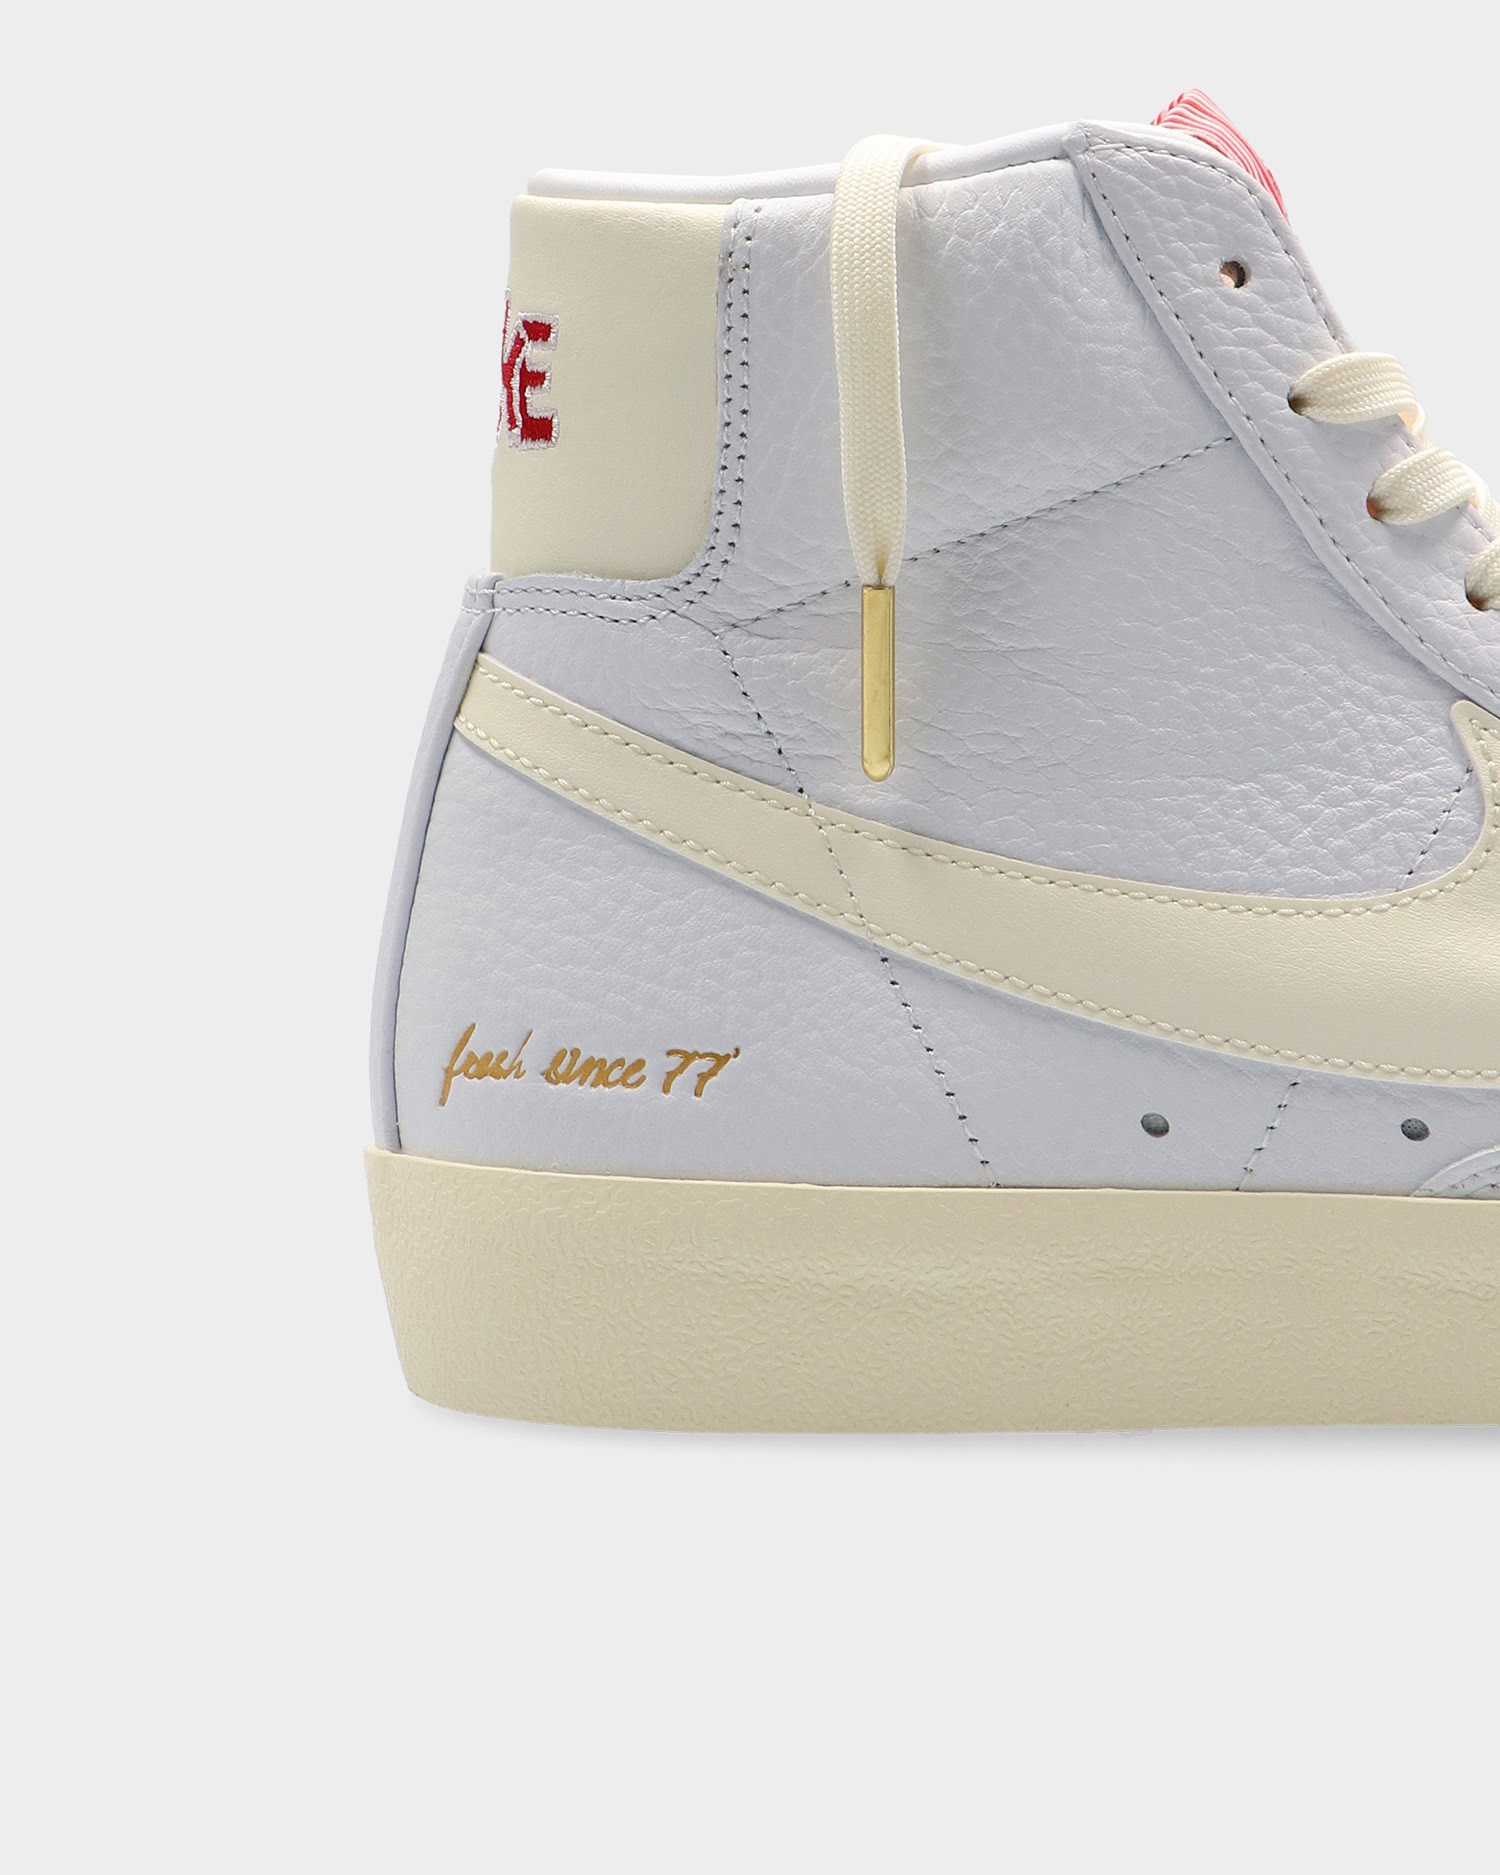 Nike Blazer mid '77 nrg White/Coconut Milk